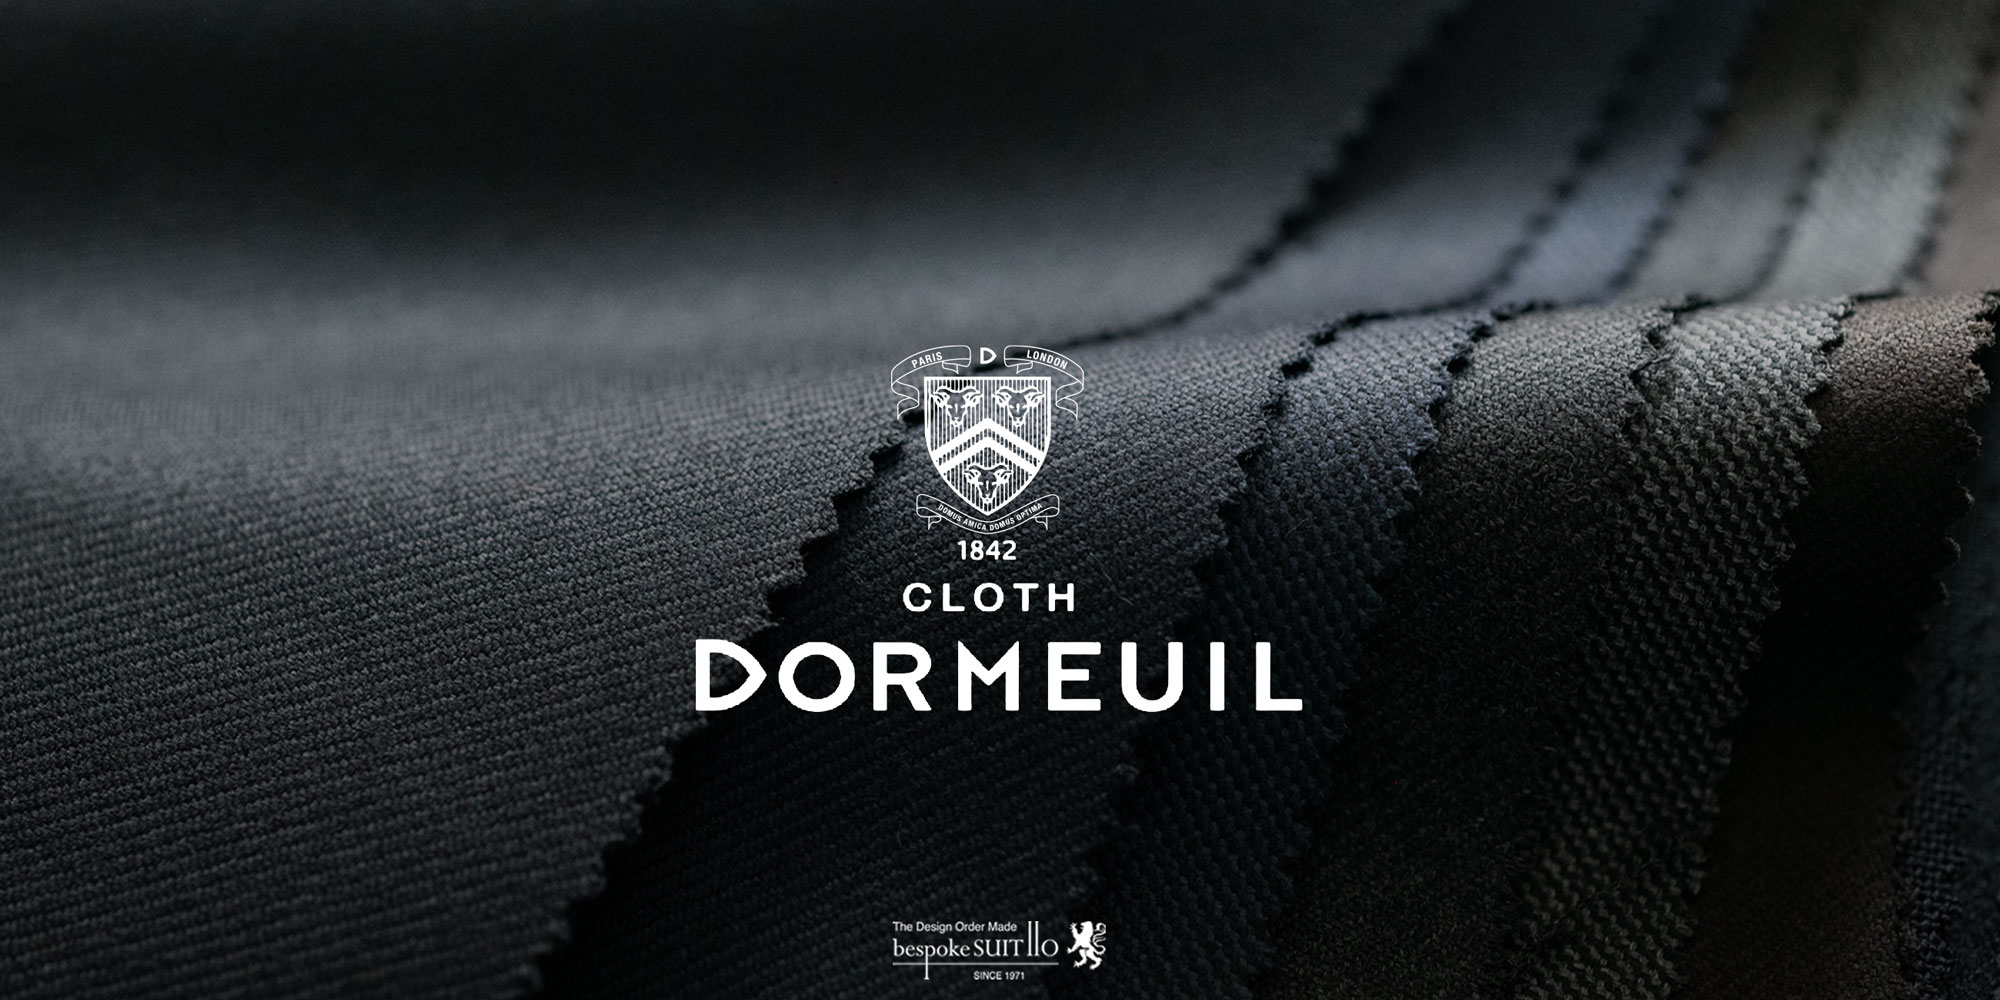 DORMEUIL(ドーメル)Super160's 8PLY・TONIK(トニック)他 MASTERPIECE(マスターピース)